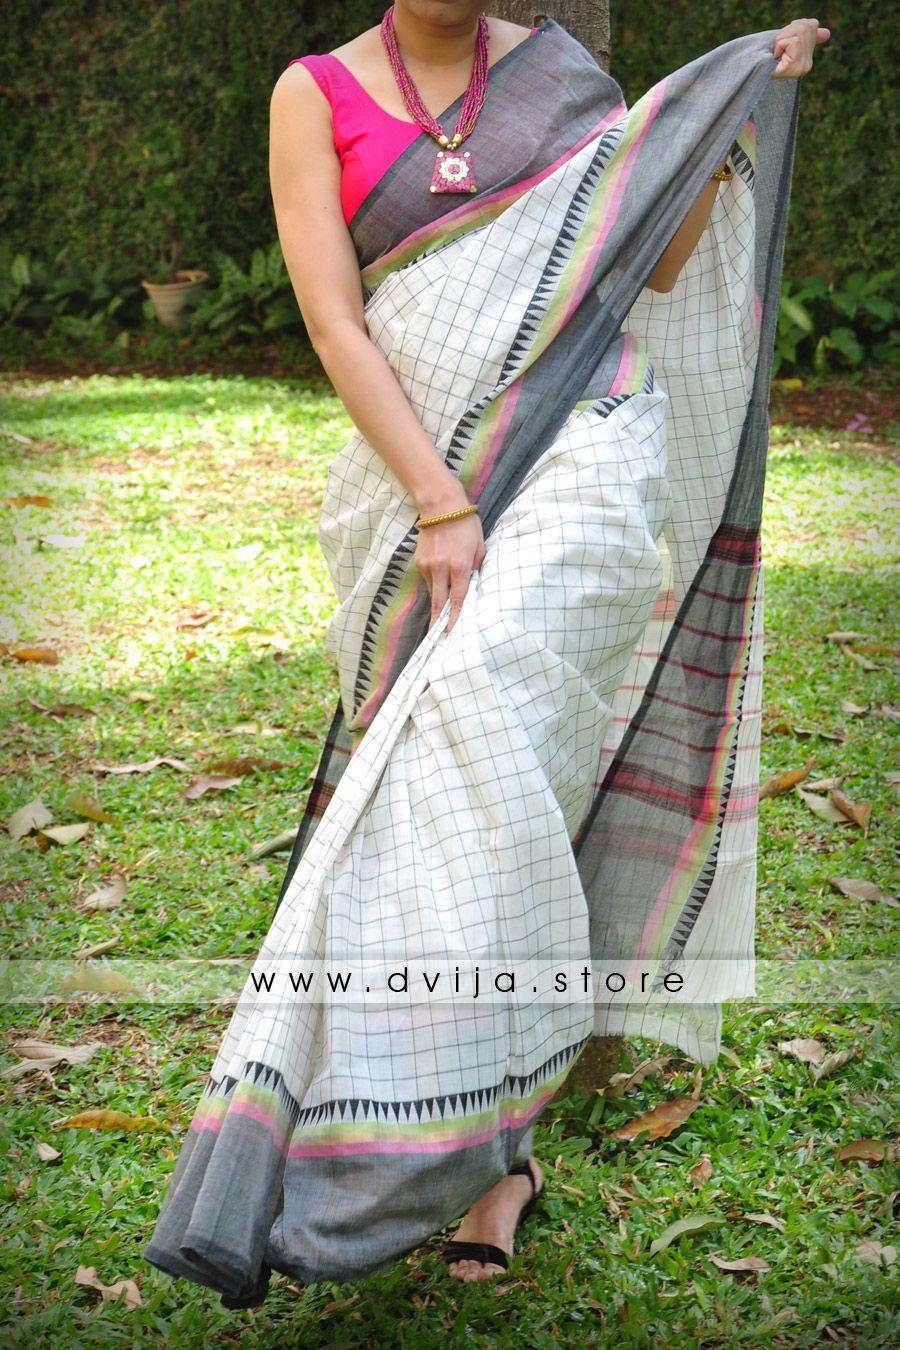 Buy Saree ProductsDvija Khadi SareePattu storeSarees uTPOZkXi